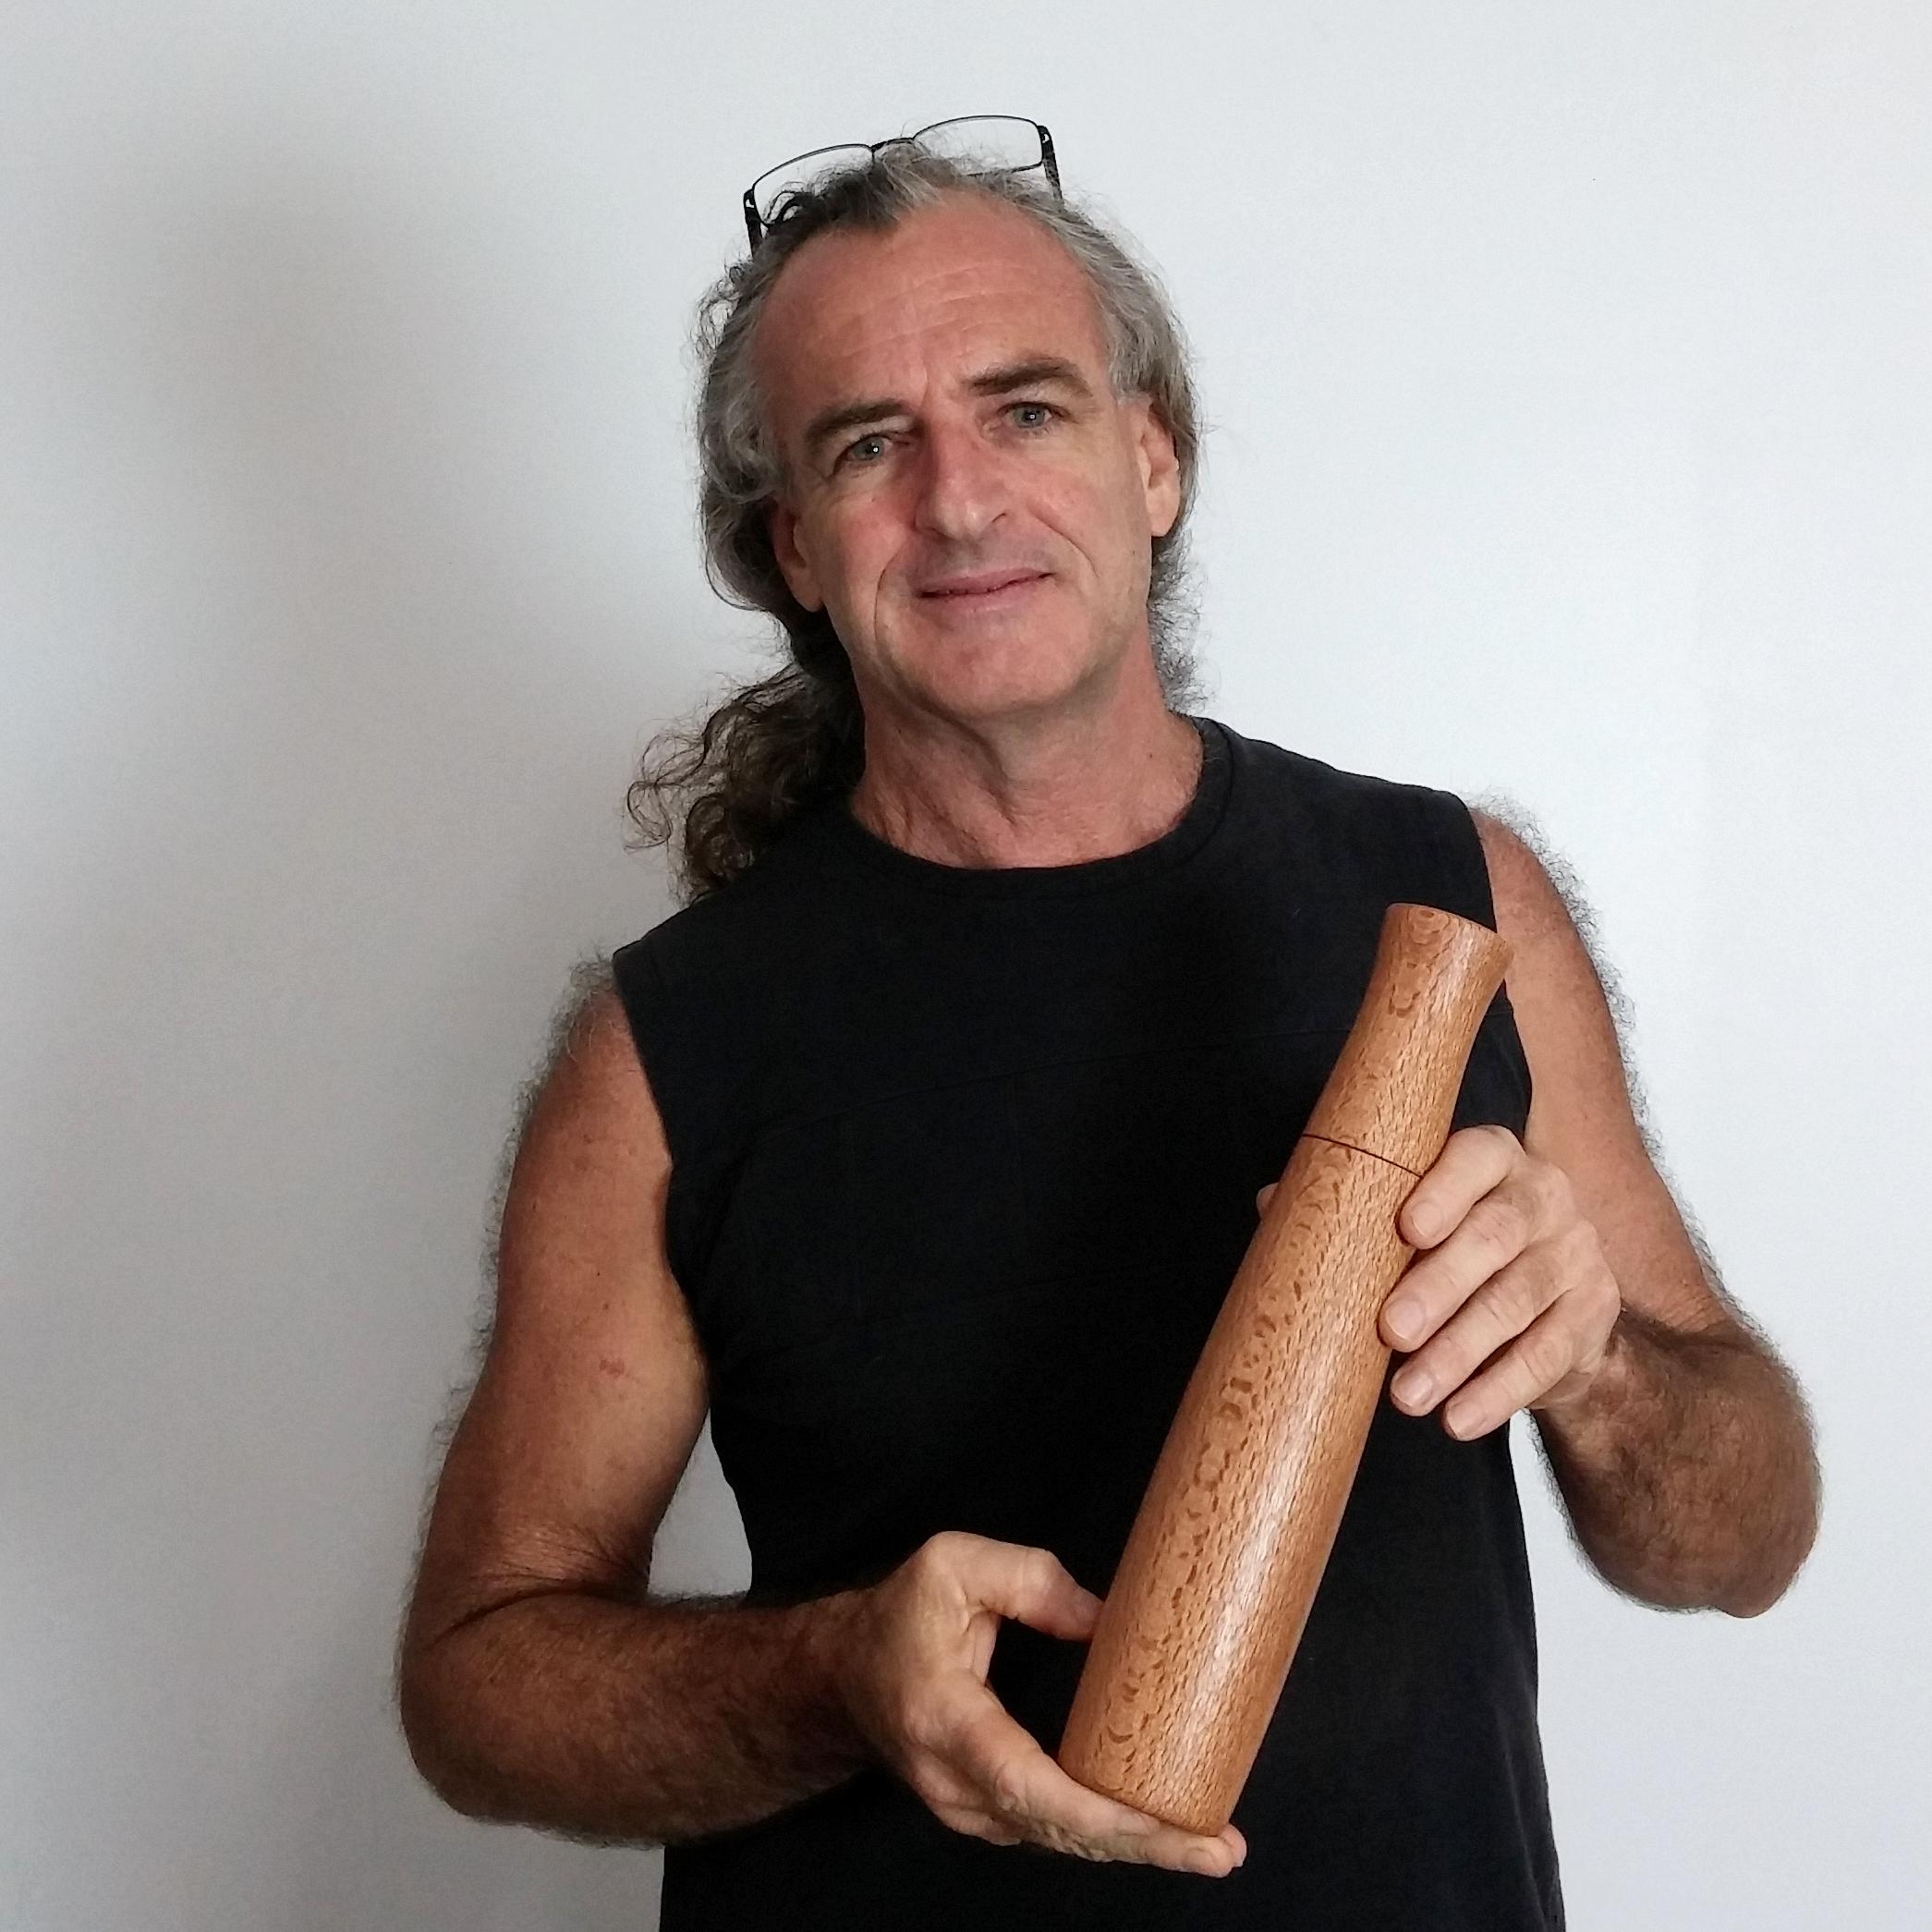 pepper grinder in queensland kauri - bob gilmour - australia